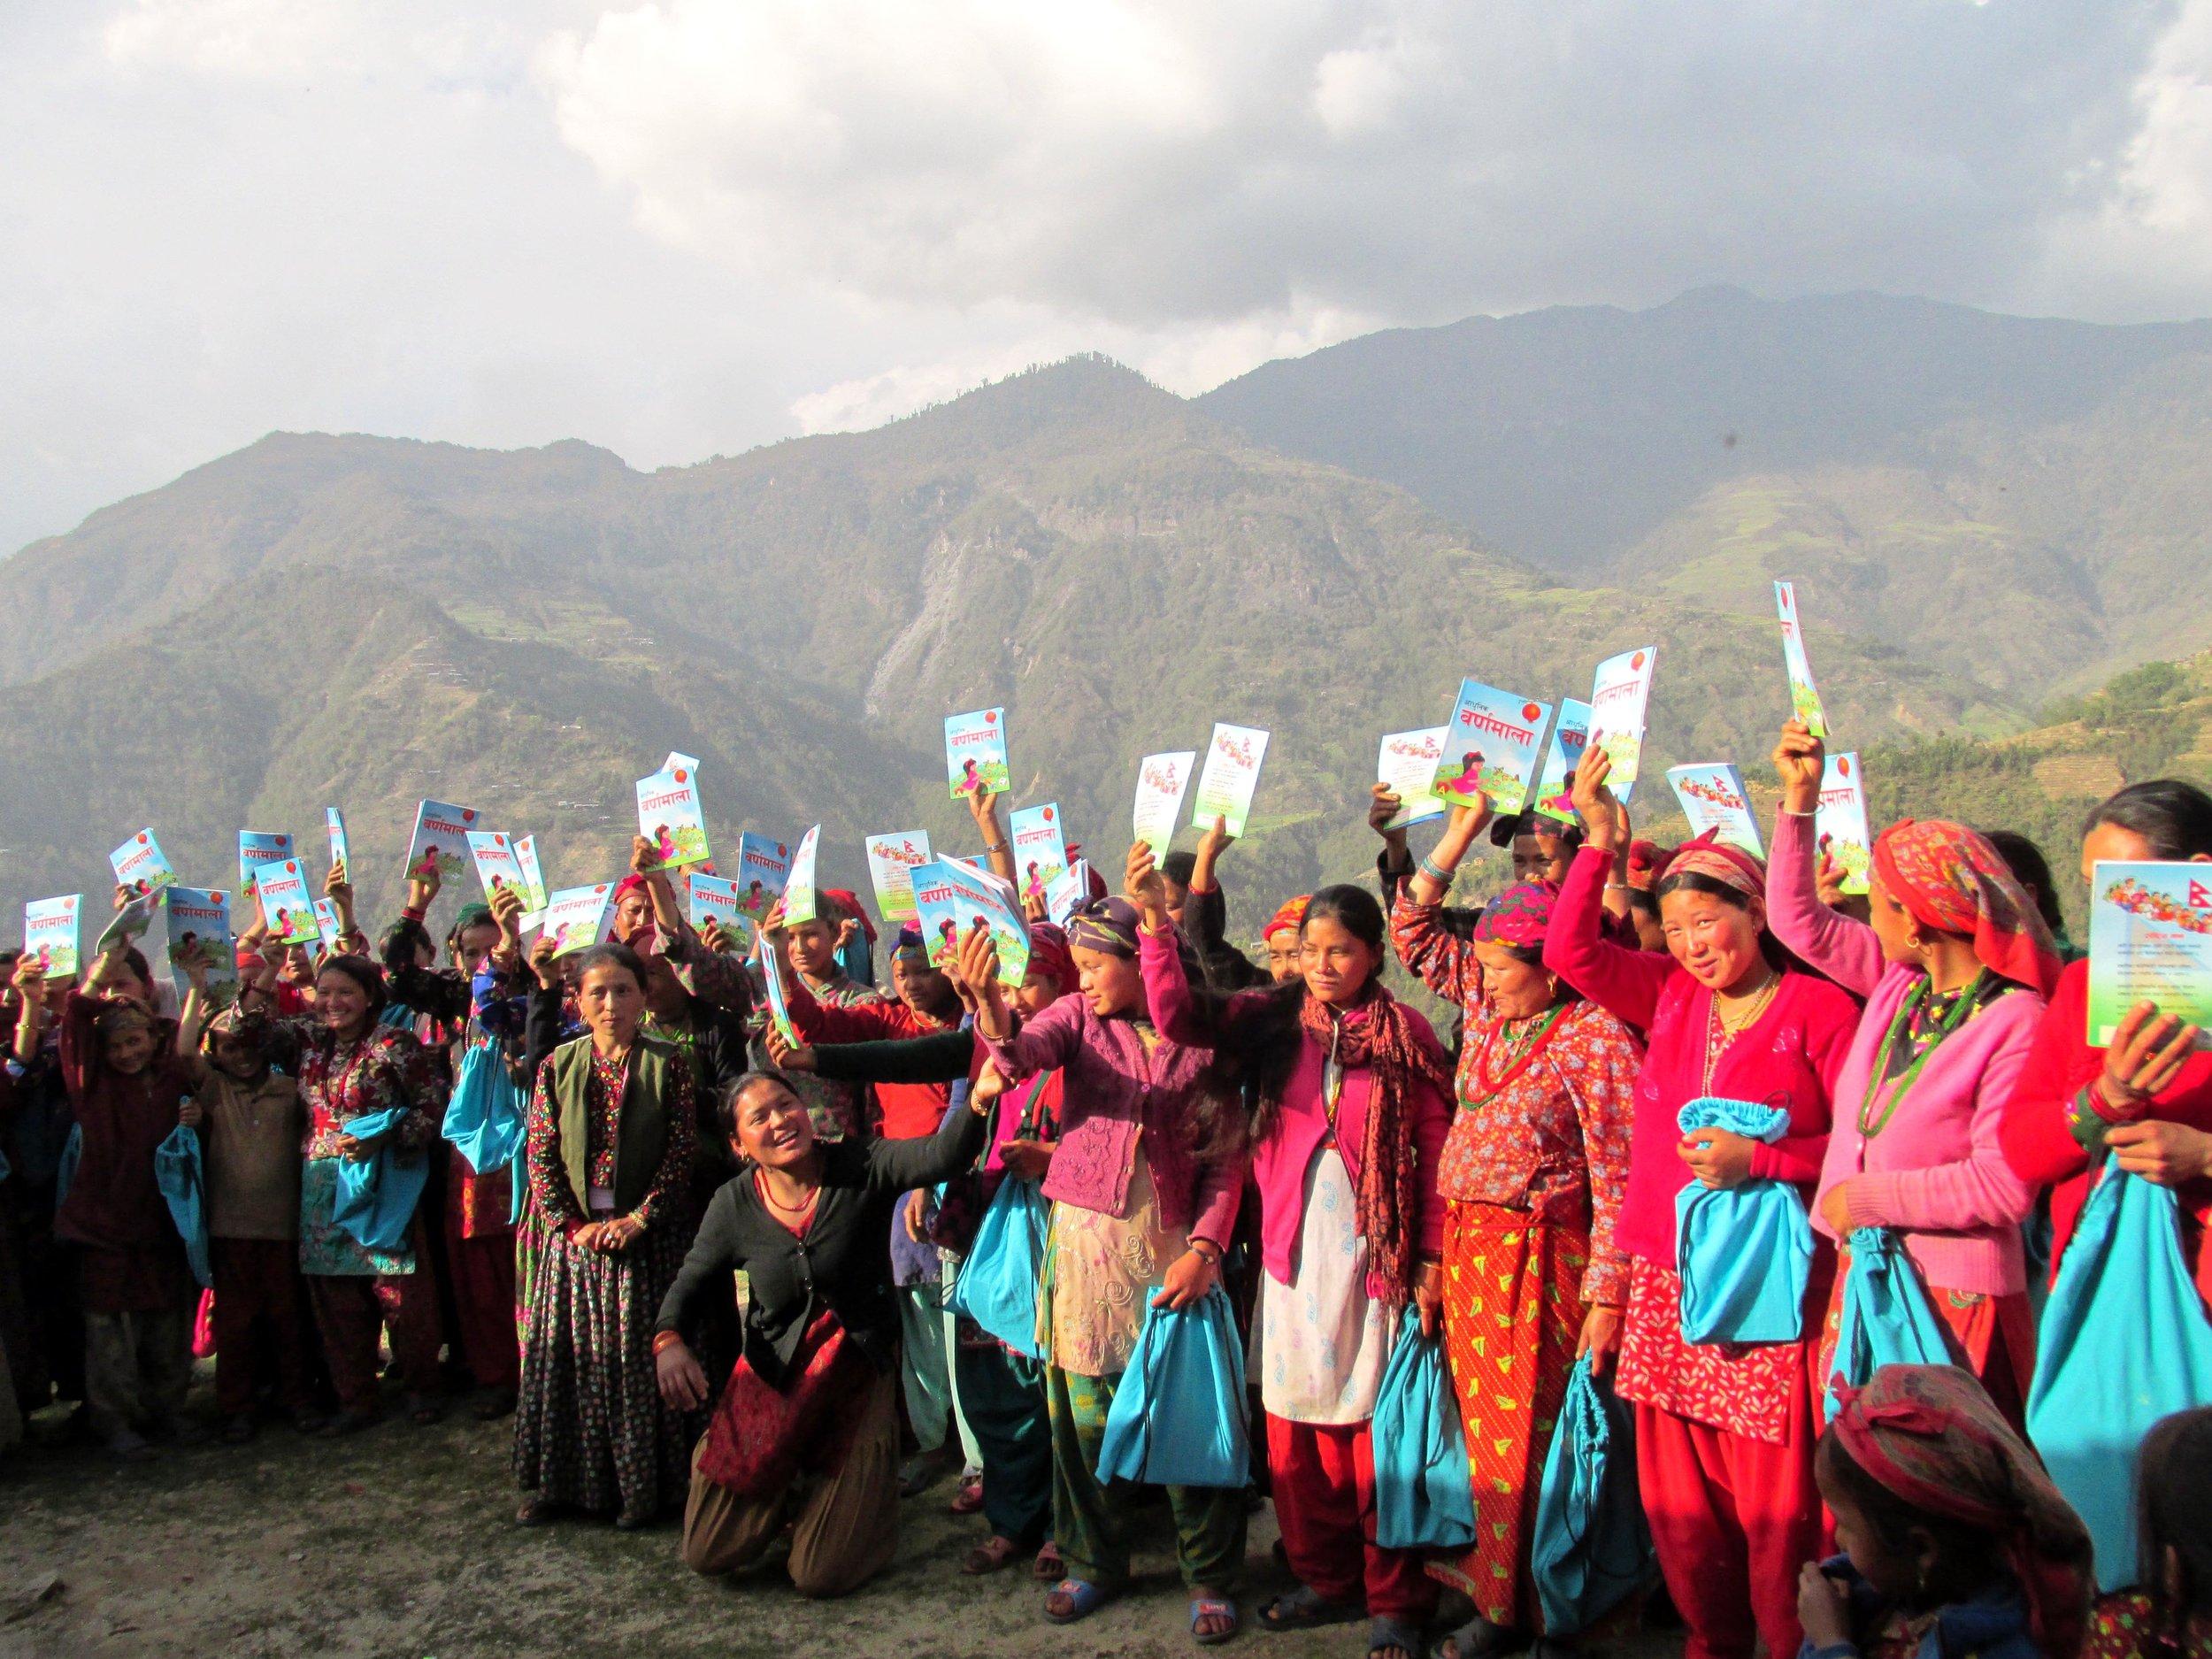 Student learnings - 1.Sustainability & Community development 2.Fair Trade 3.Microfinance & Social Entrepreneurship 4.Gender equality